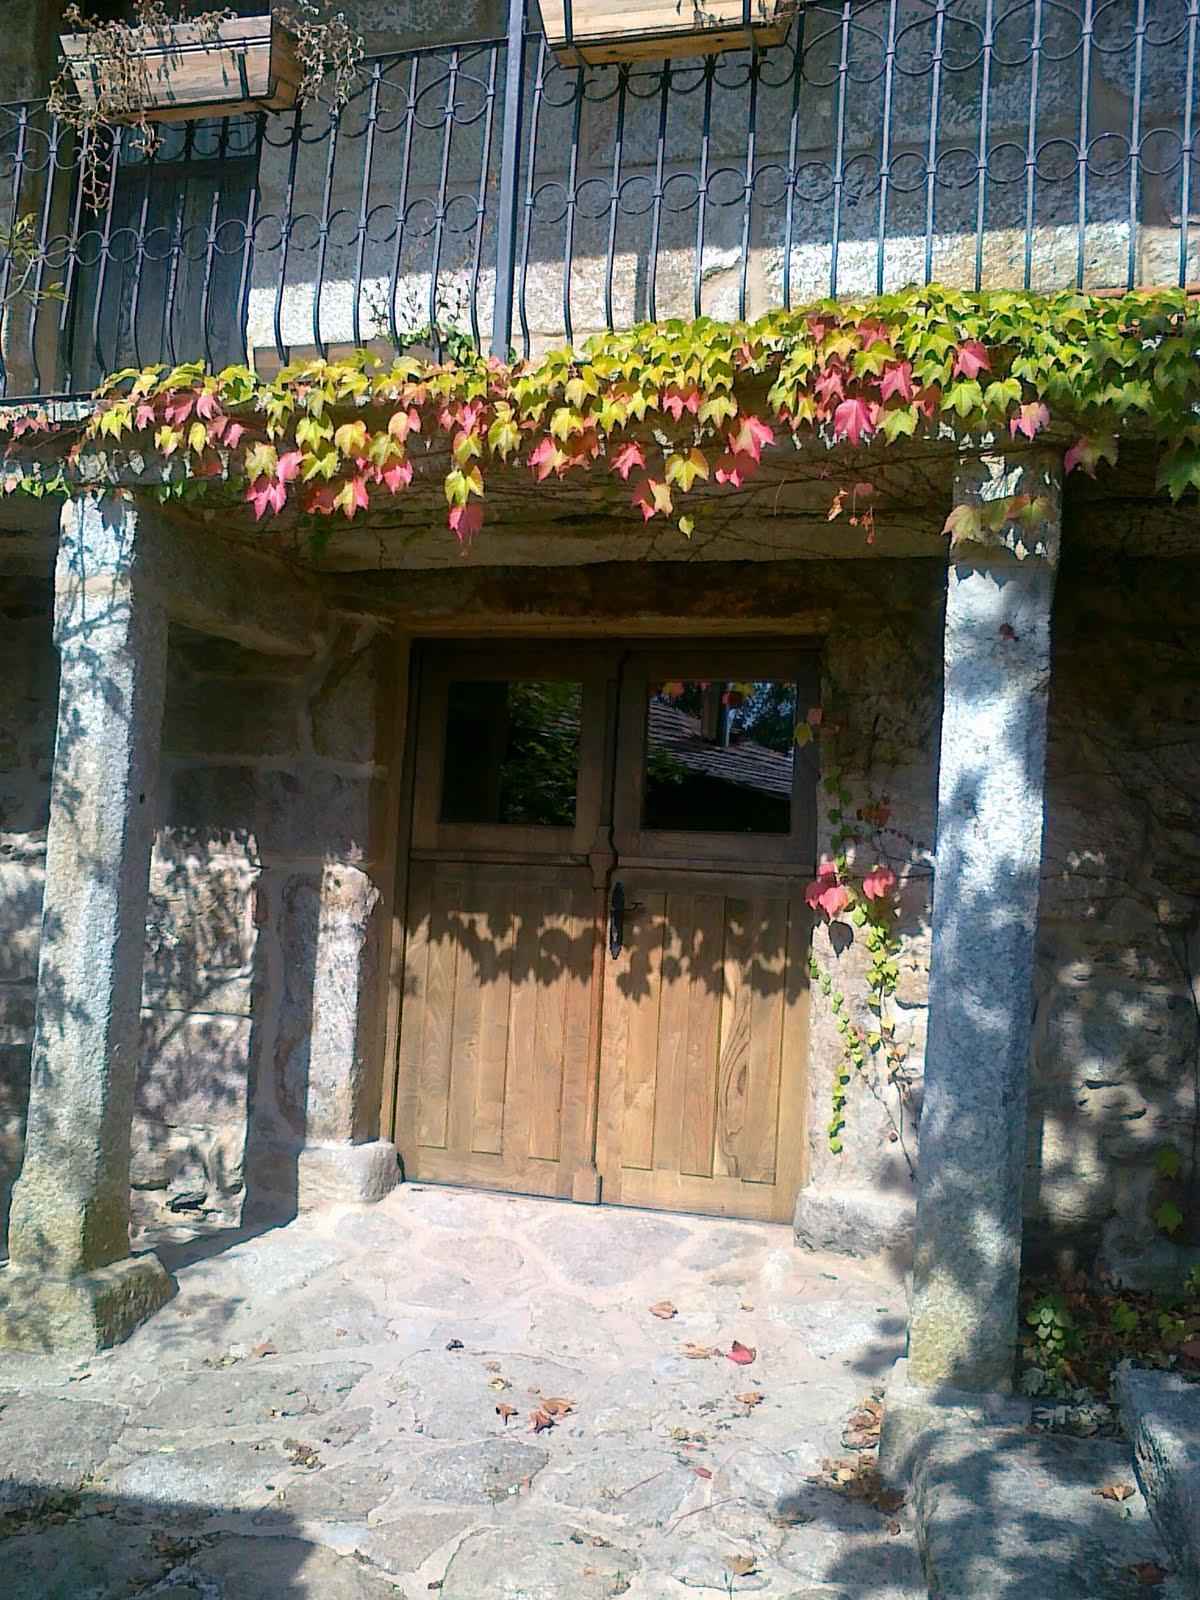 Congostro reserva de la biosfera momento verde momentos de gloria - Casa tipica gallega ...